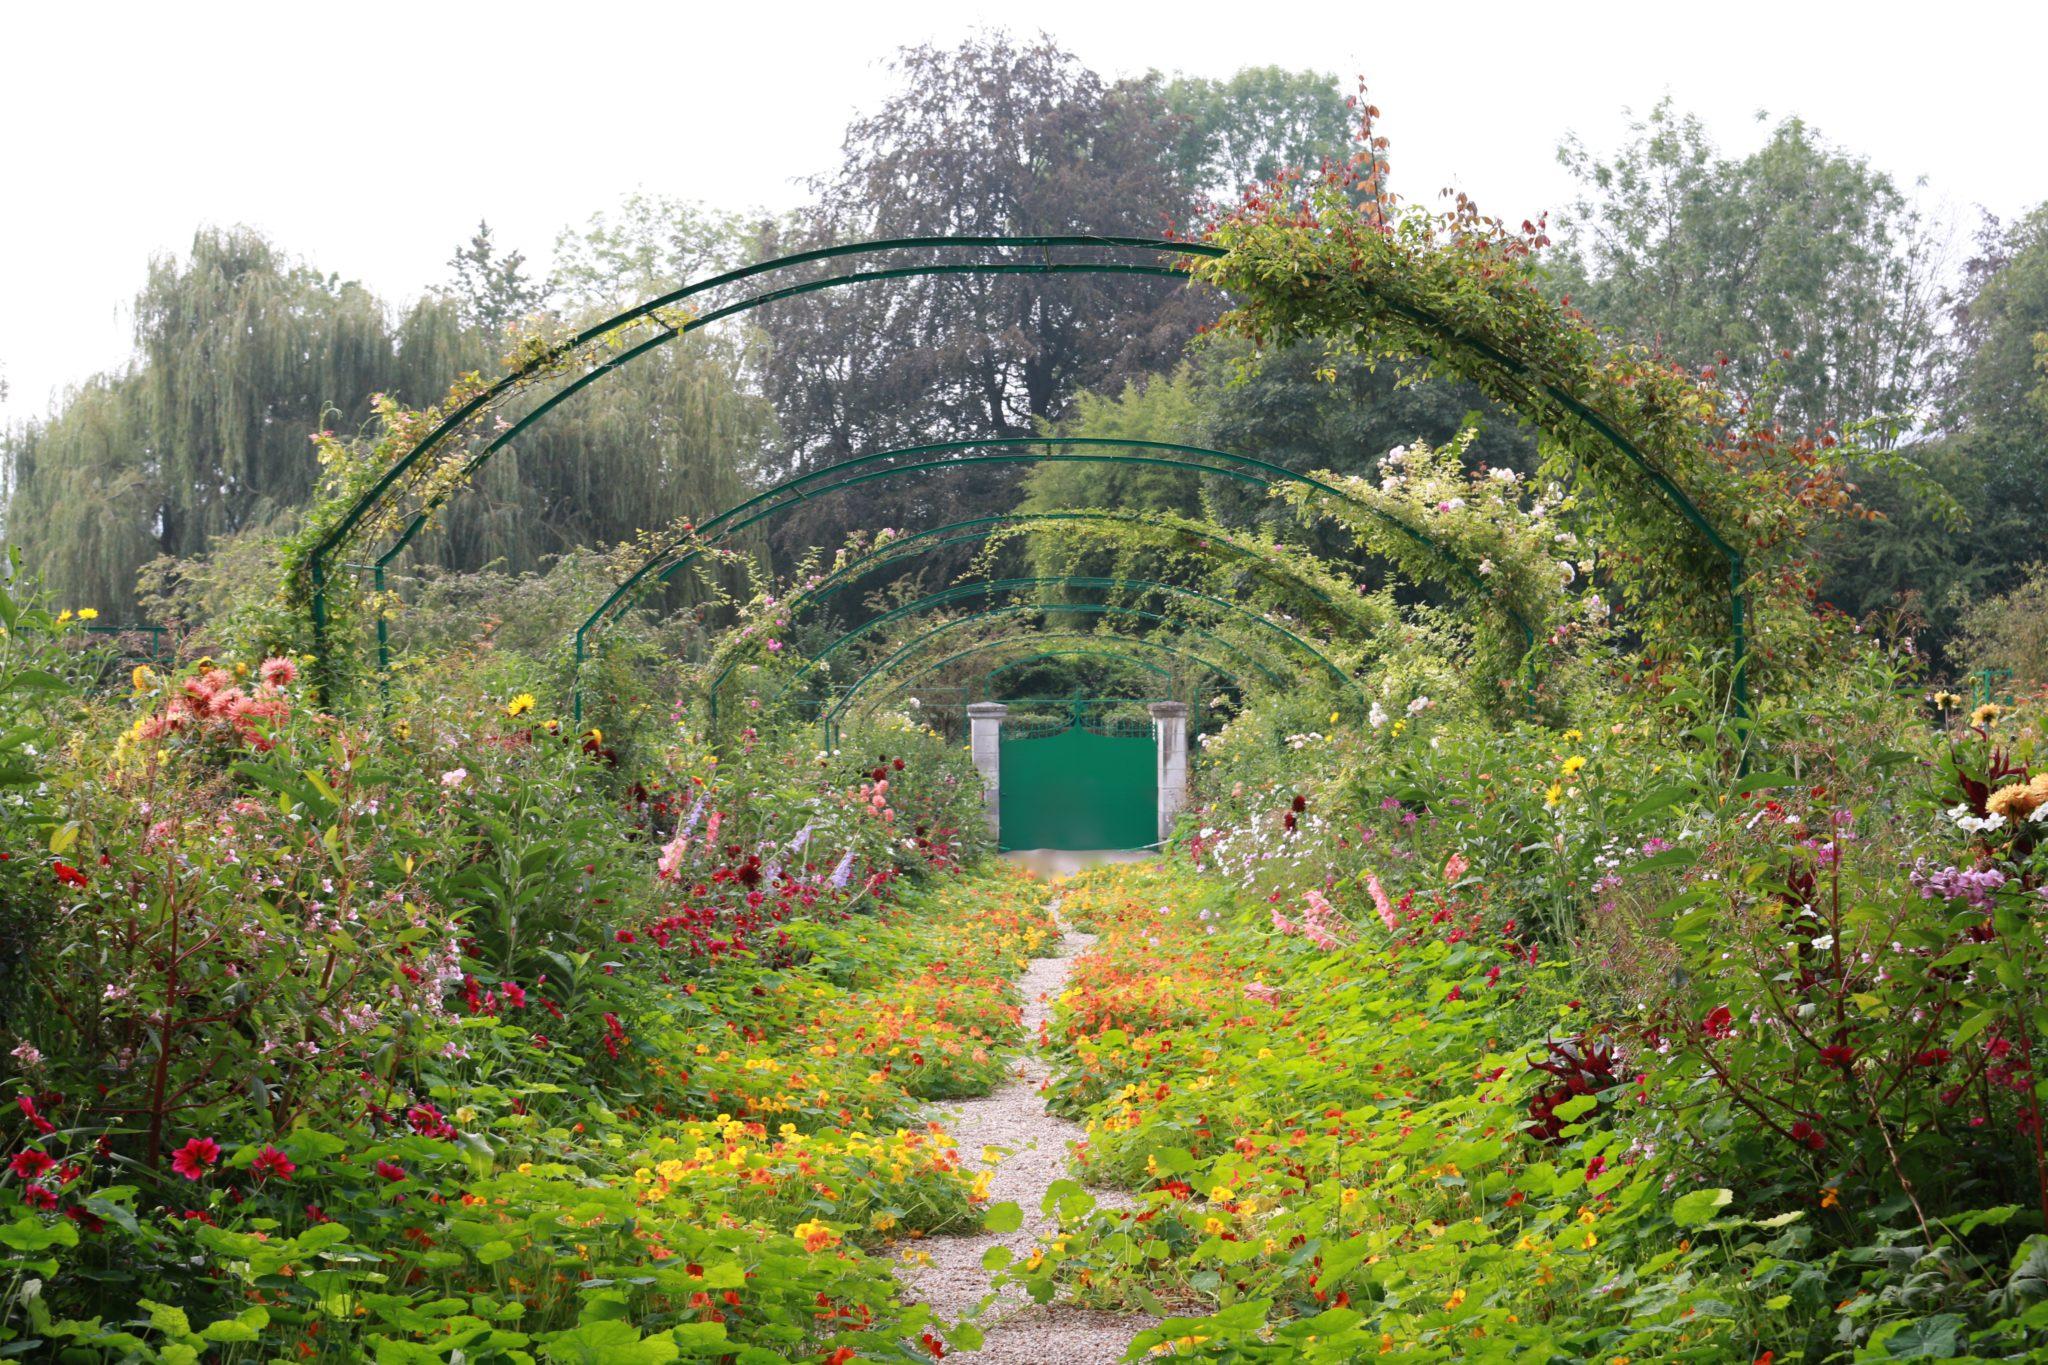 Monet's Garden – An Impressionist's Inspiration